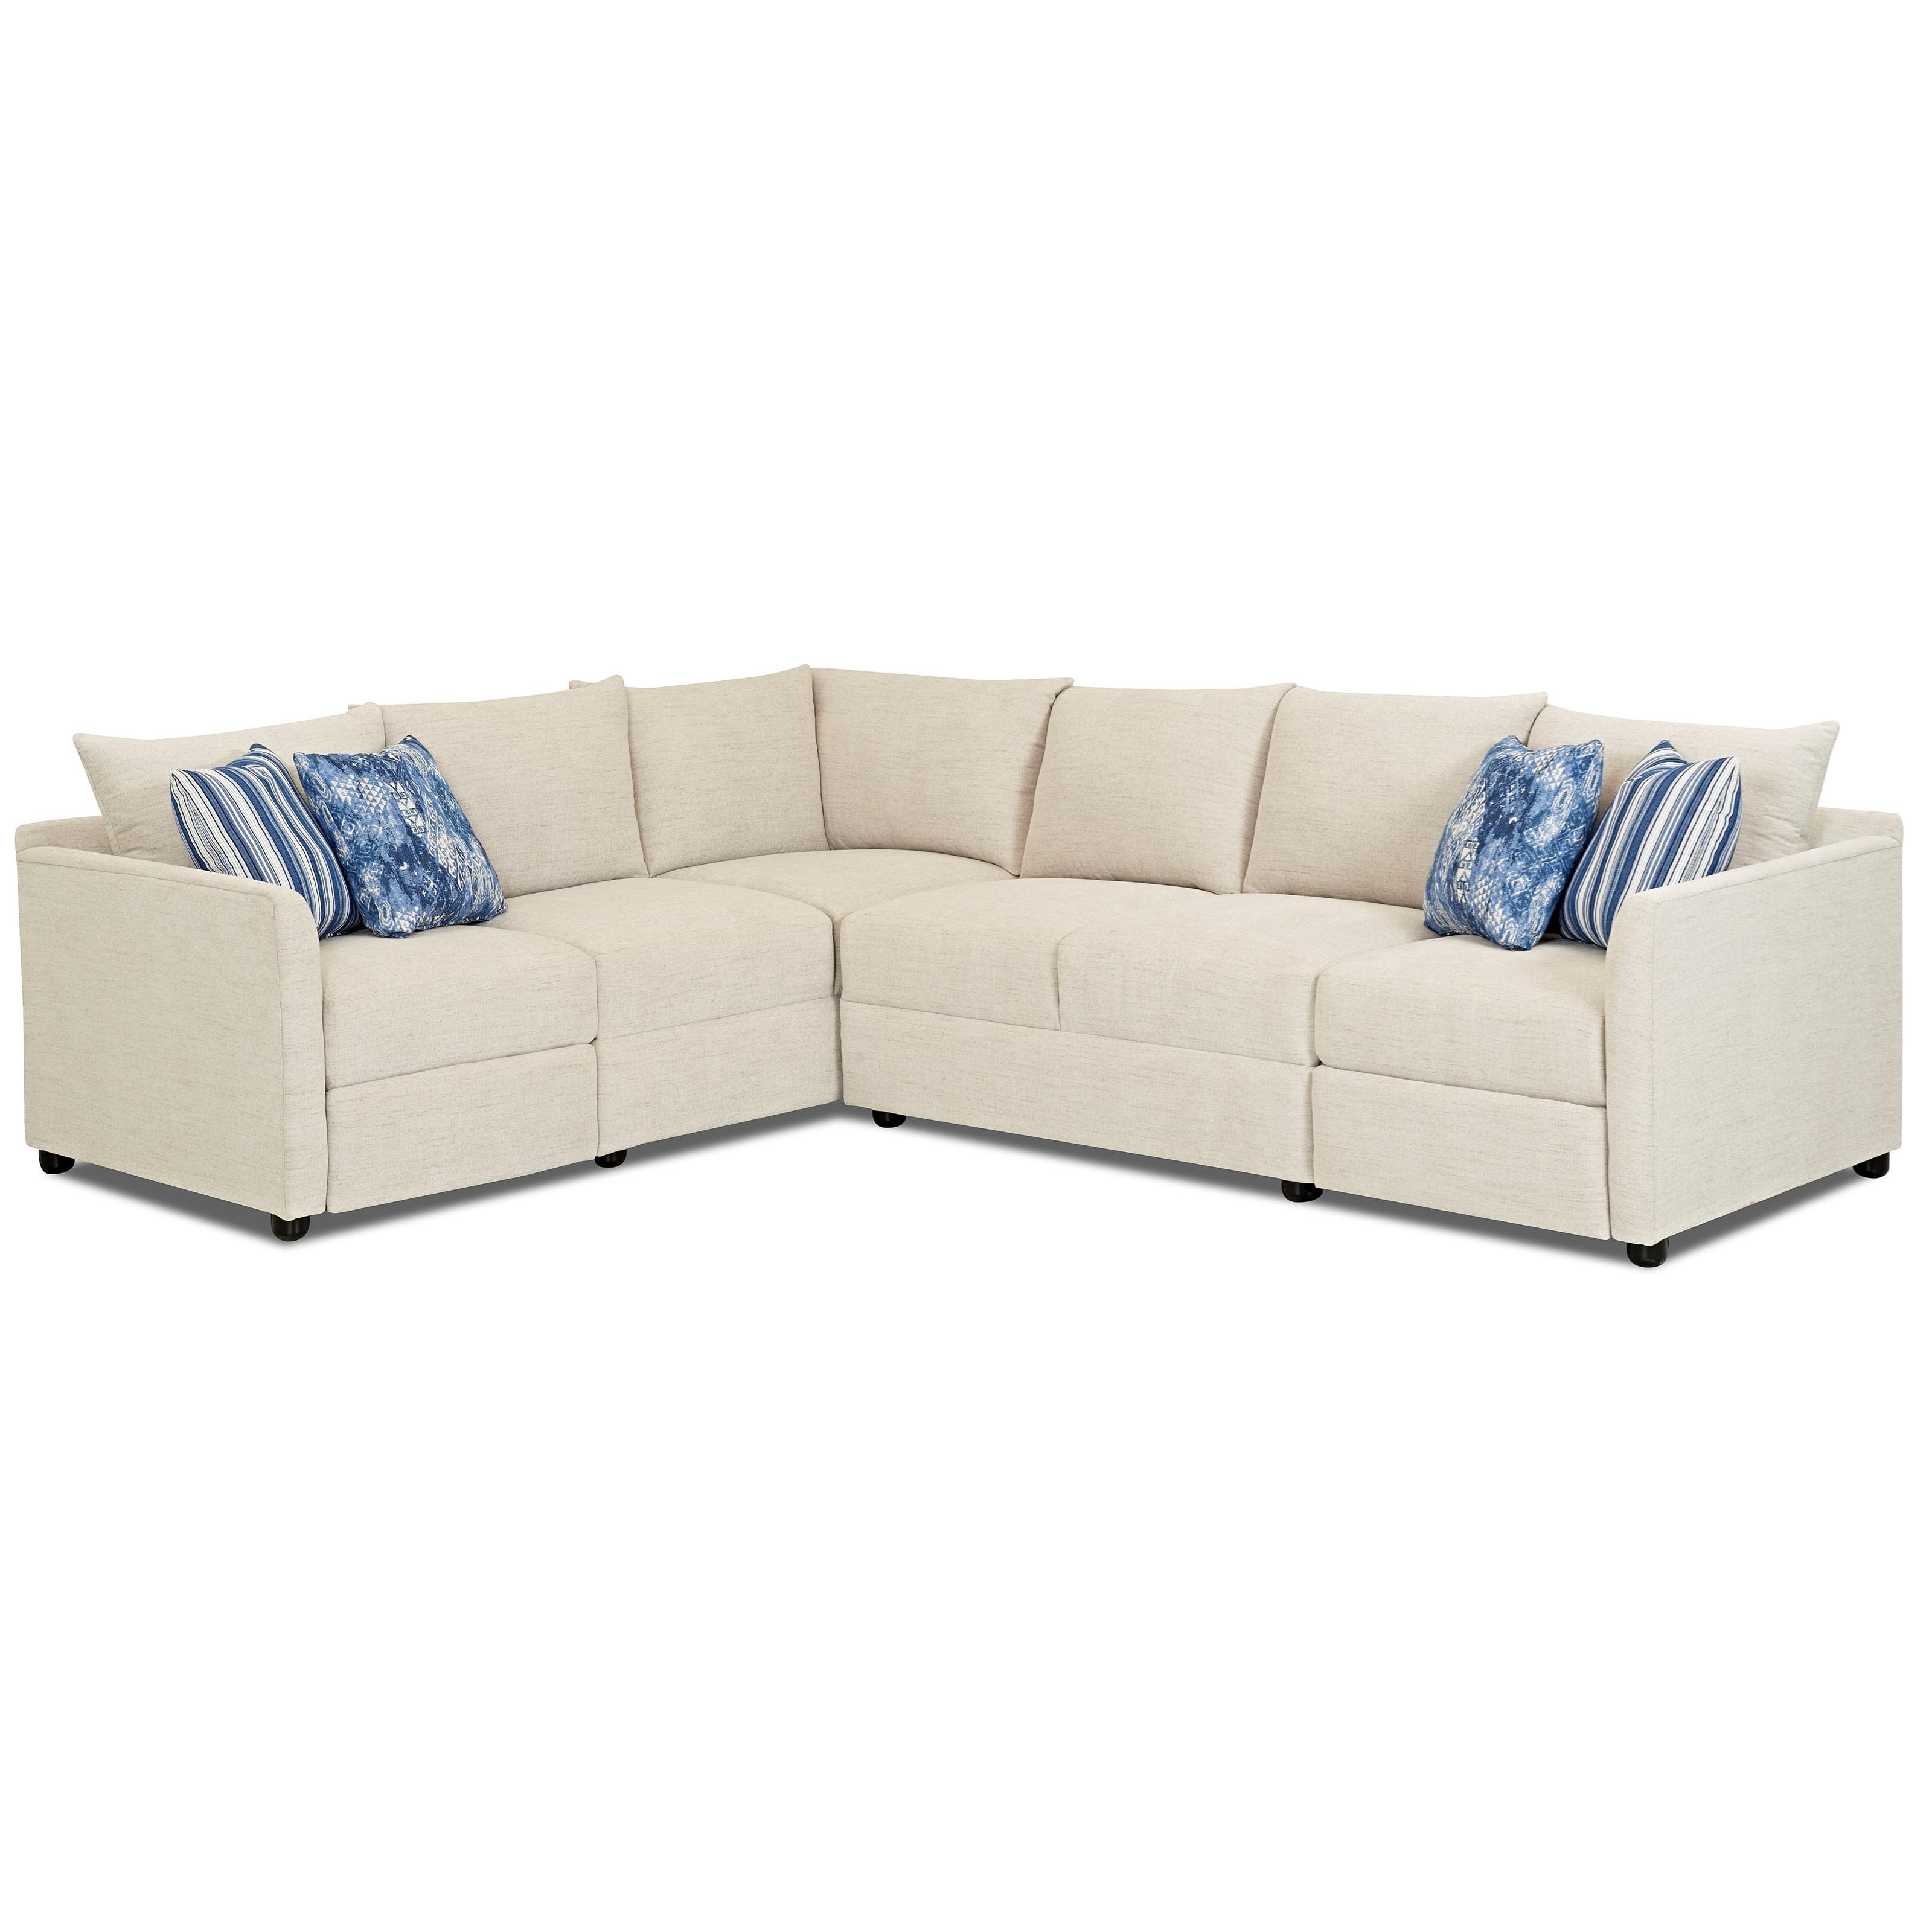 Trisha Yearwood Home Atlanta2 Pc Power Hybrid Reclining Sectional Sofa ...